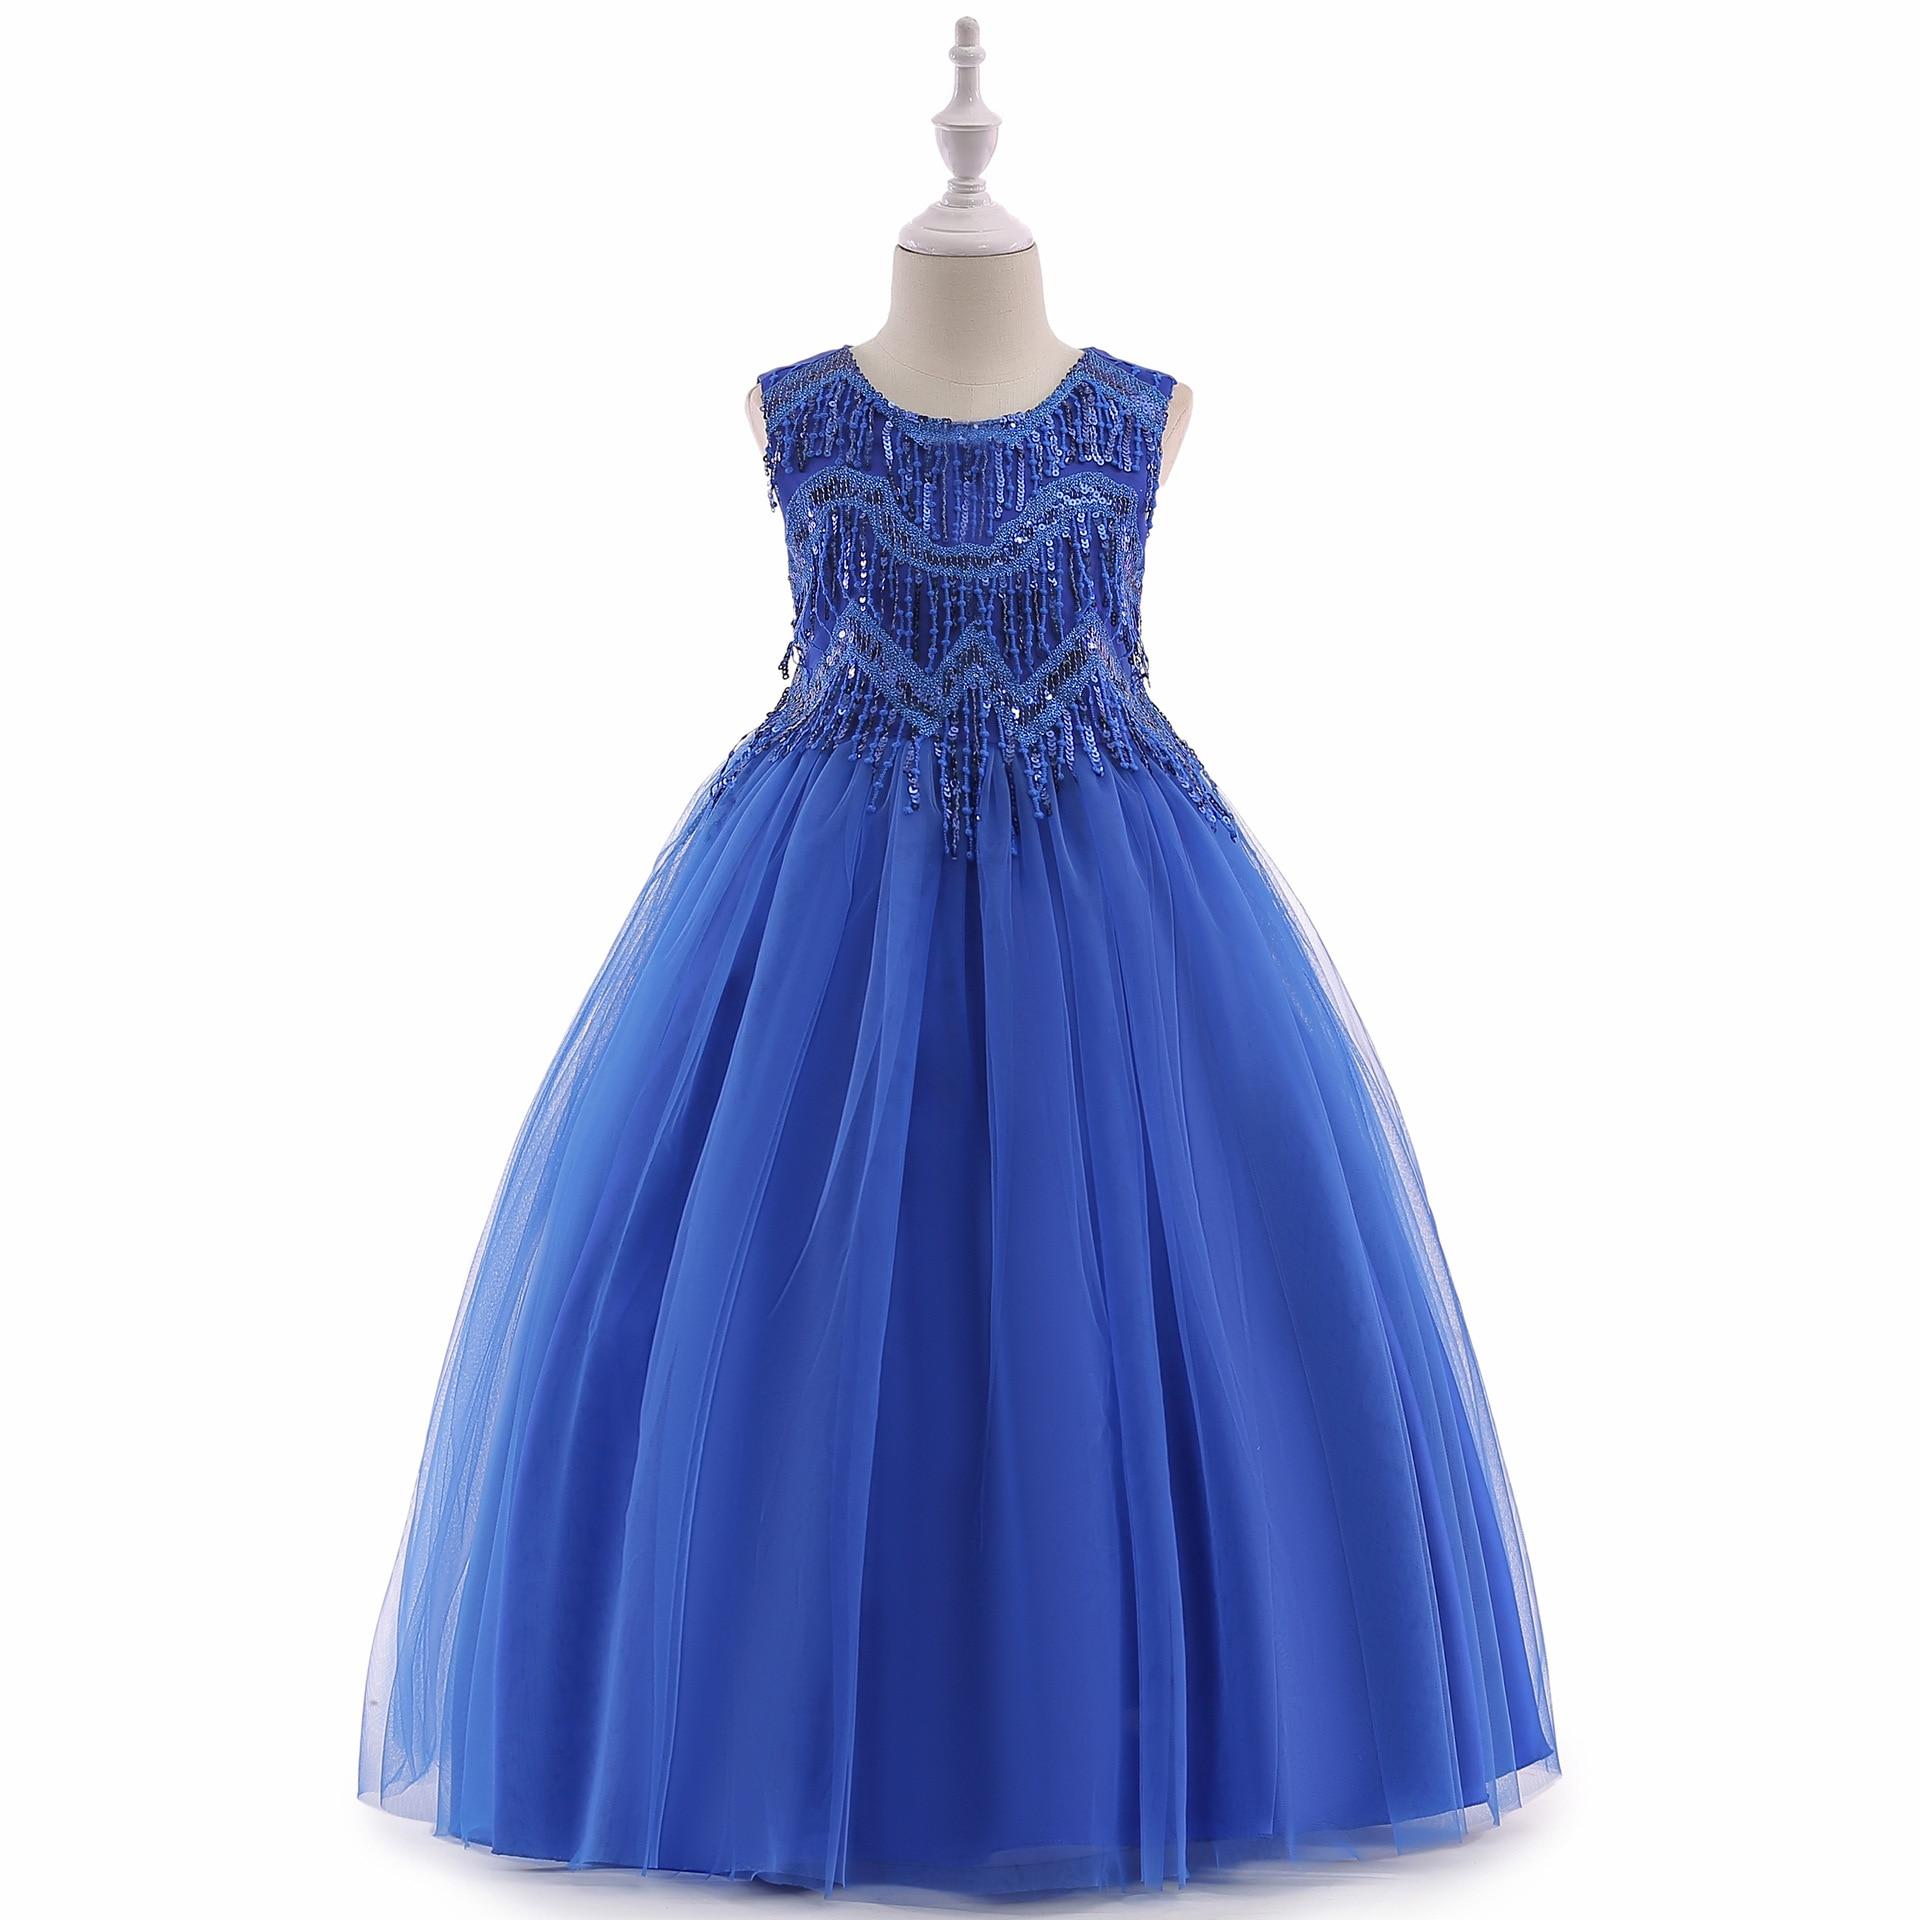 631f519be Royal Blue Flower Girl Dresses Amazon